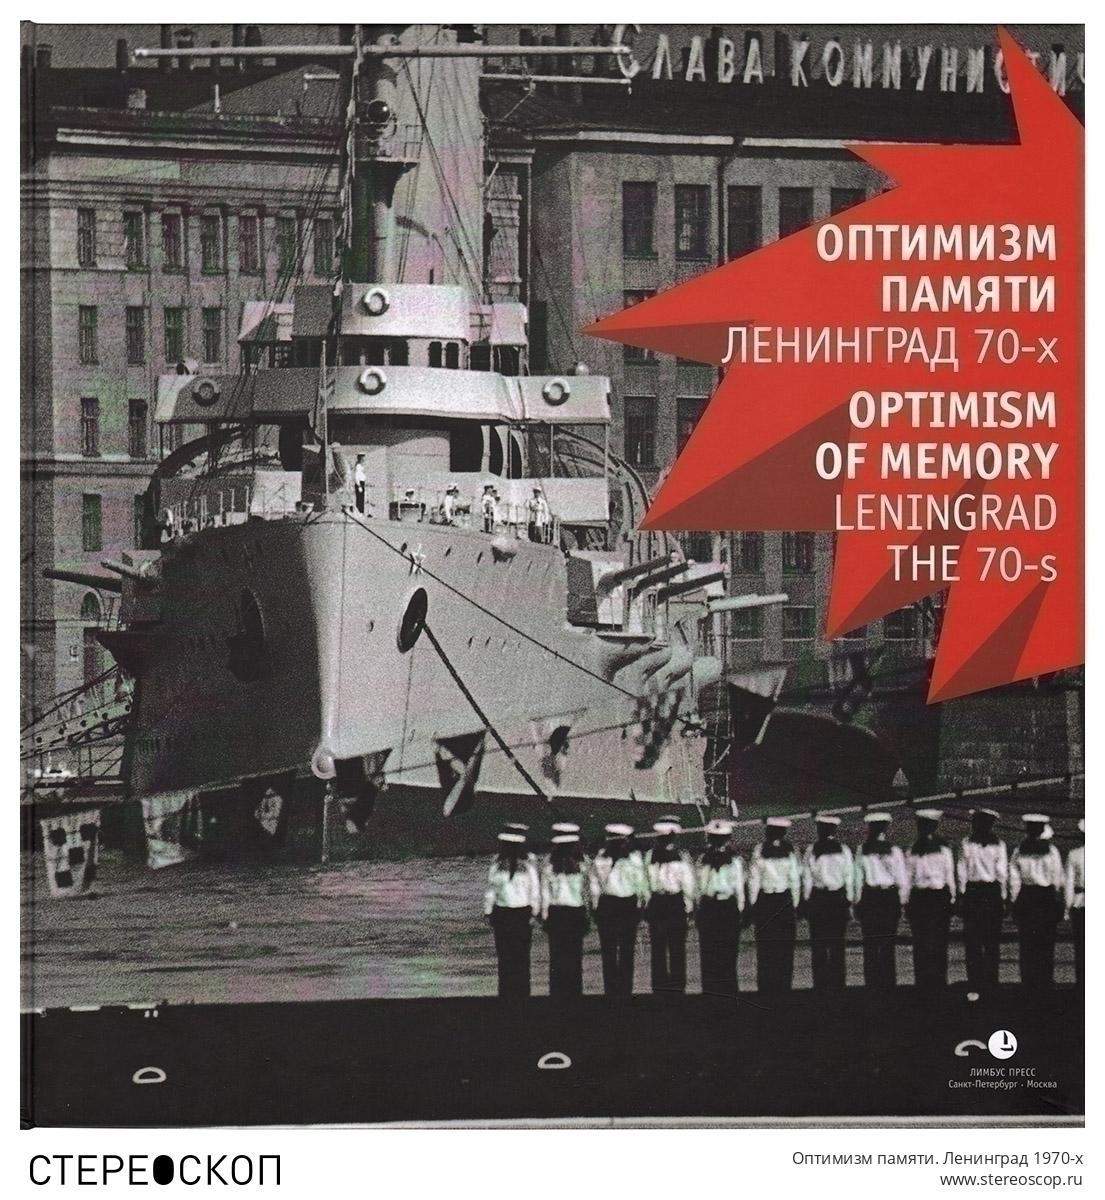 Оптимизм памяти. Ленинград 1970-х